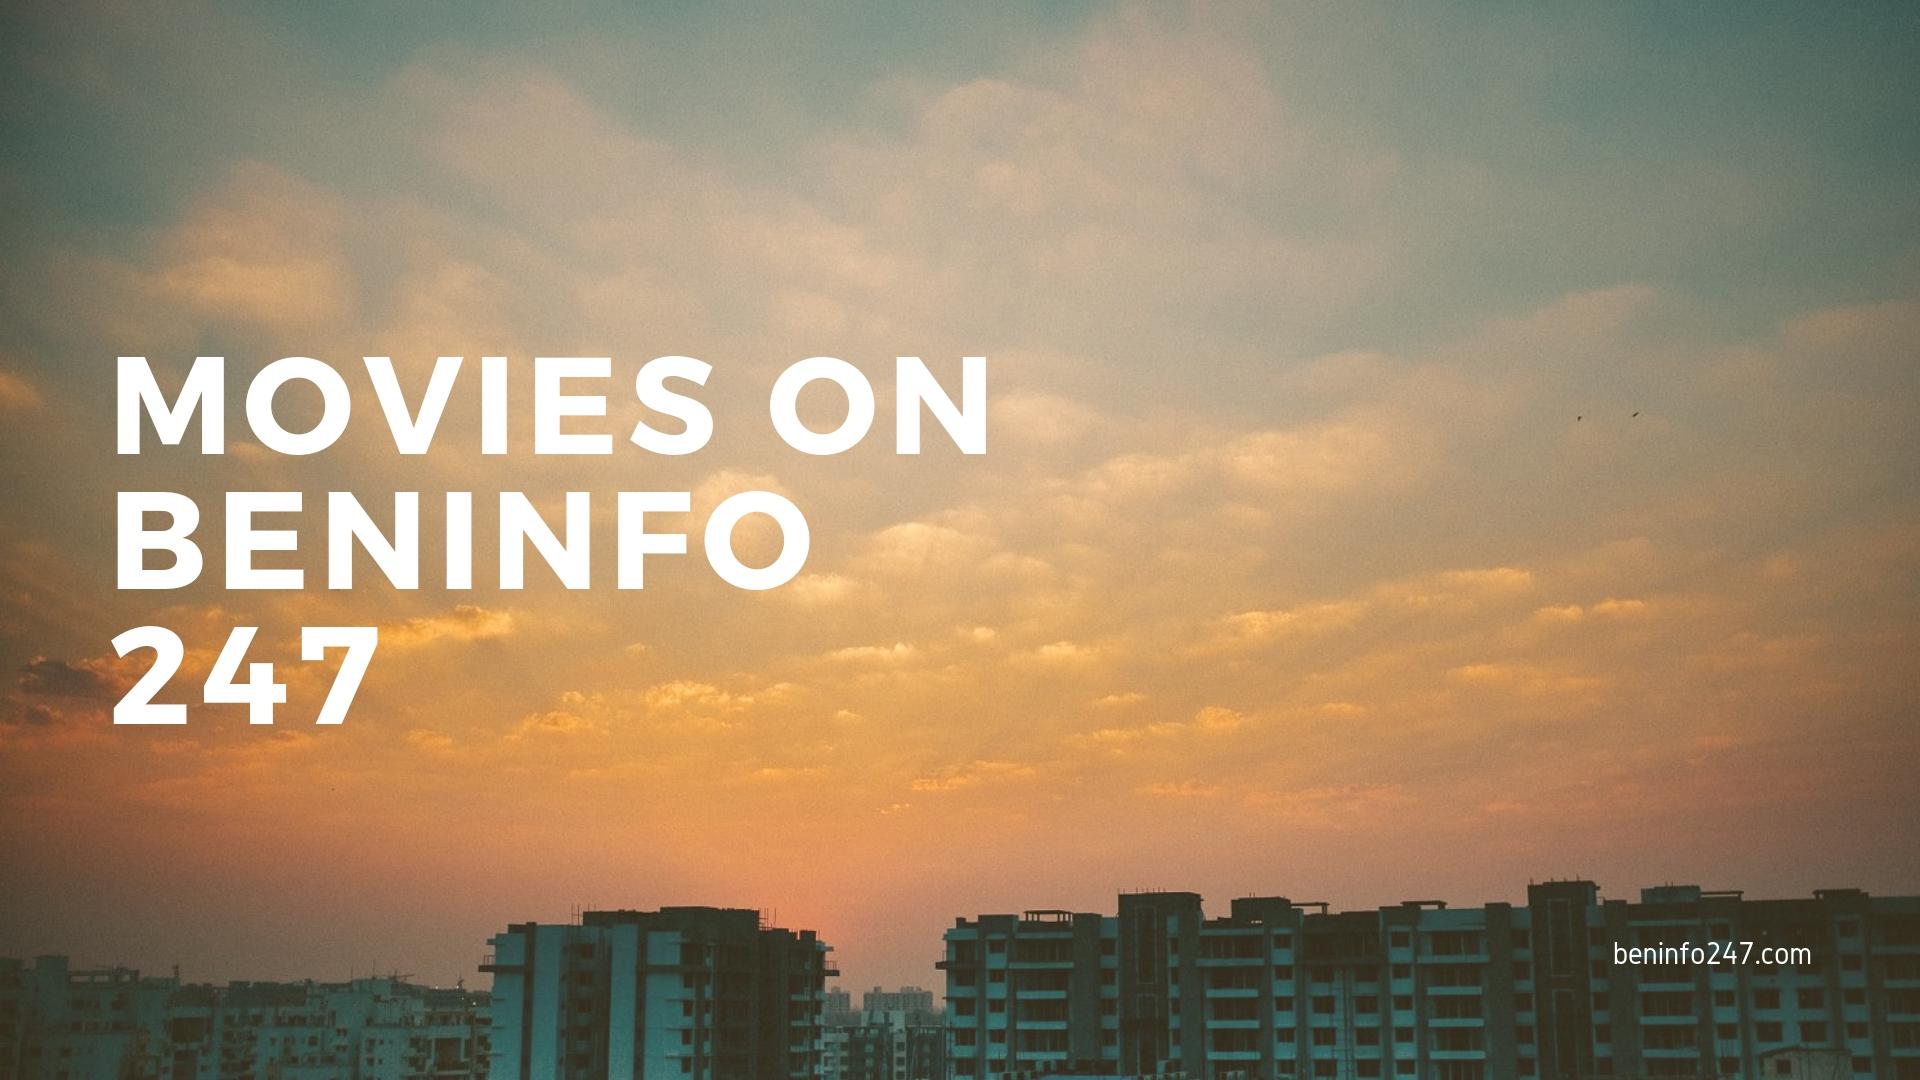 beninfo247 movies